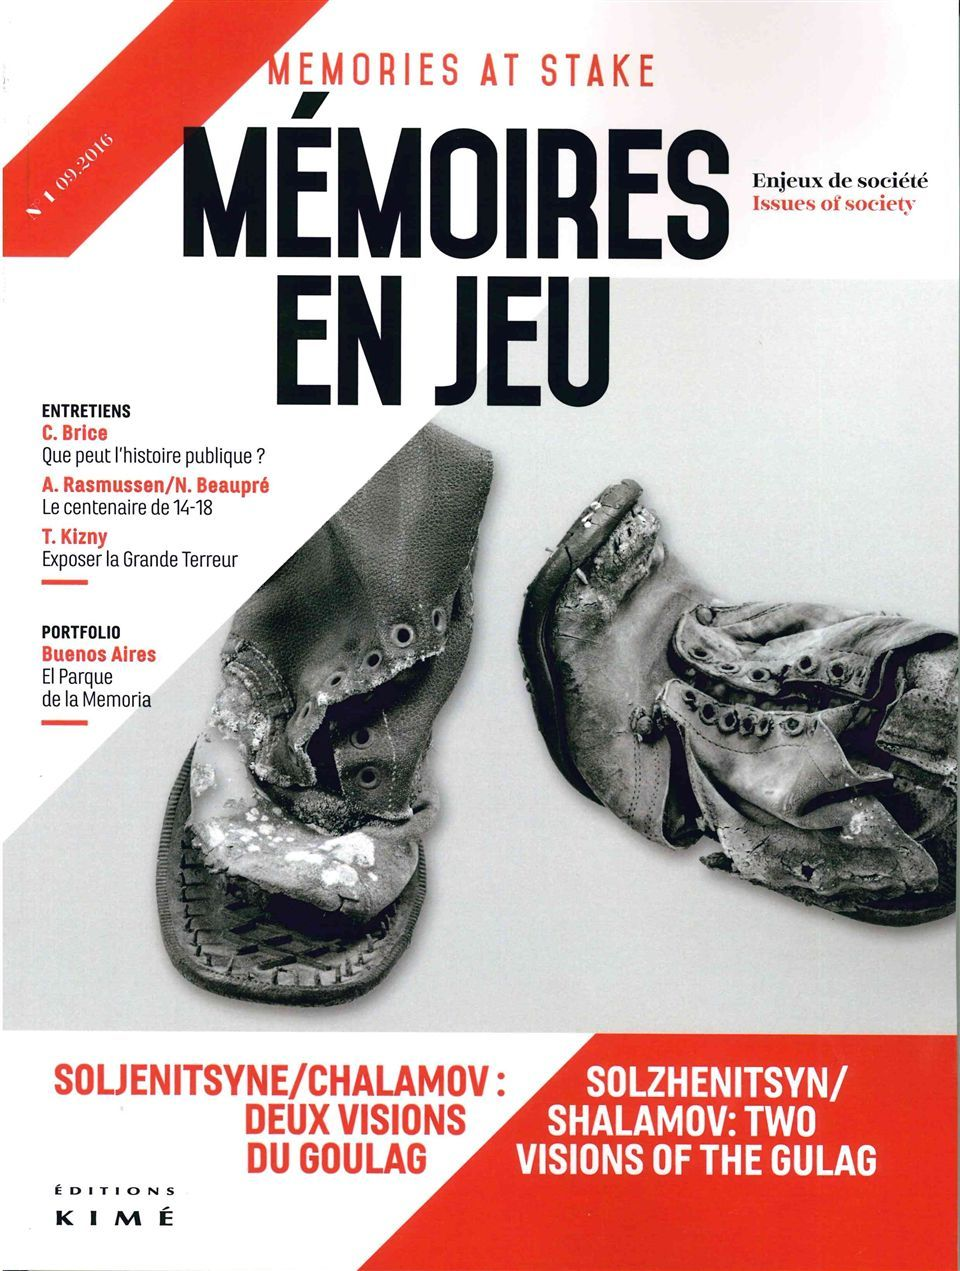 MEMOIRES EN JEU N 1 - SOLJENITSYNE VERSUS CHALAMOV